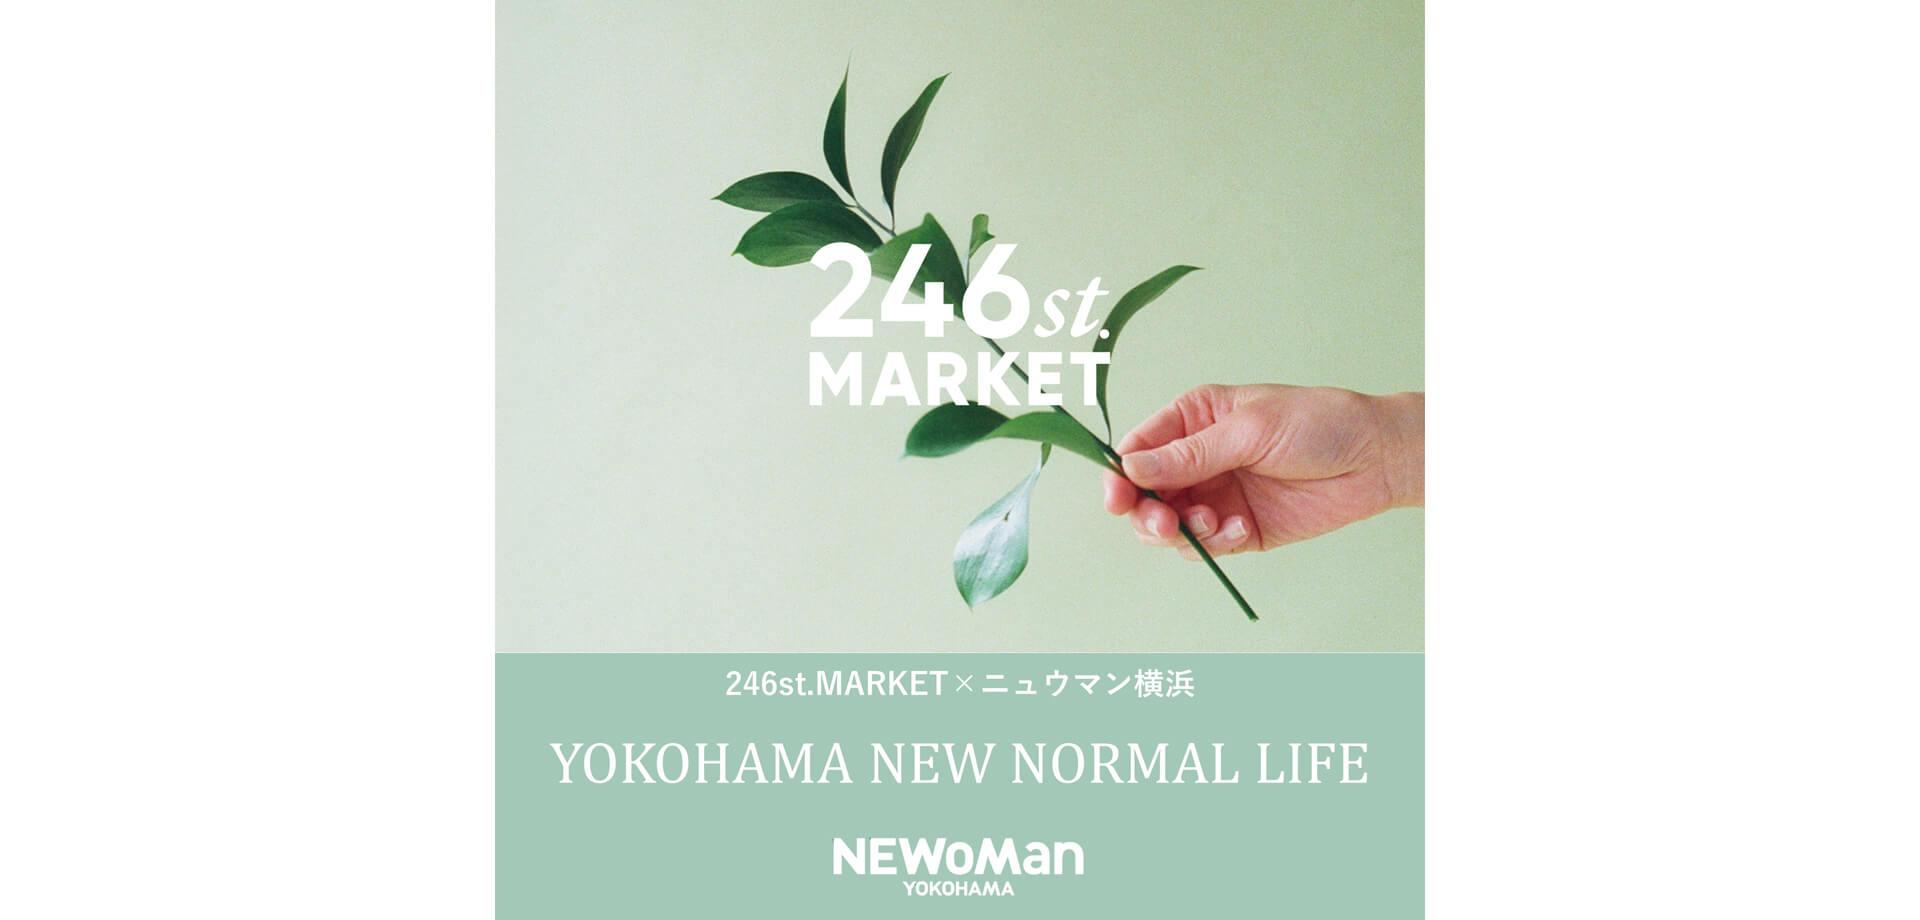 YOKOHAMA NEW NORMAL LIFE